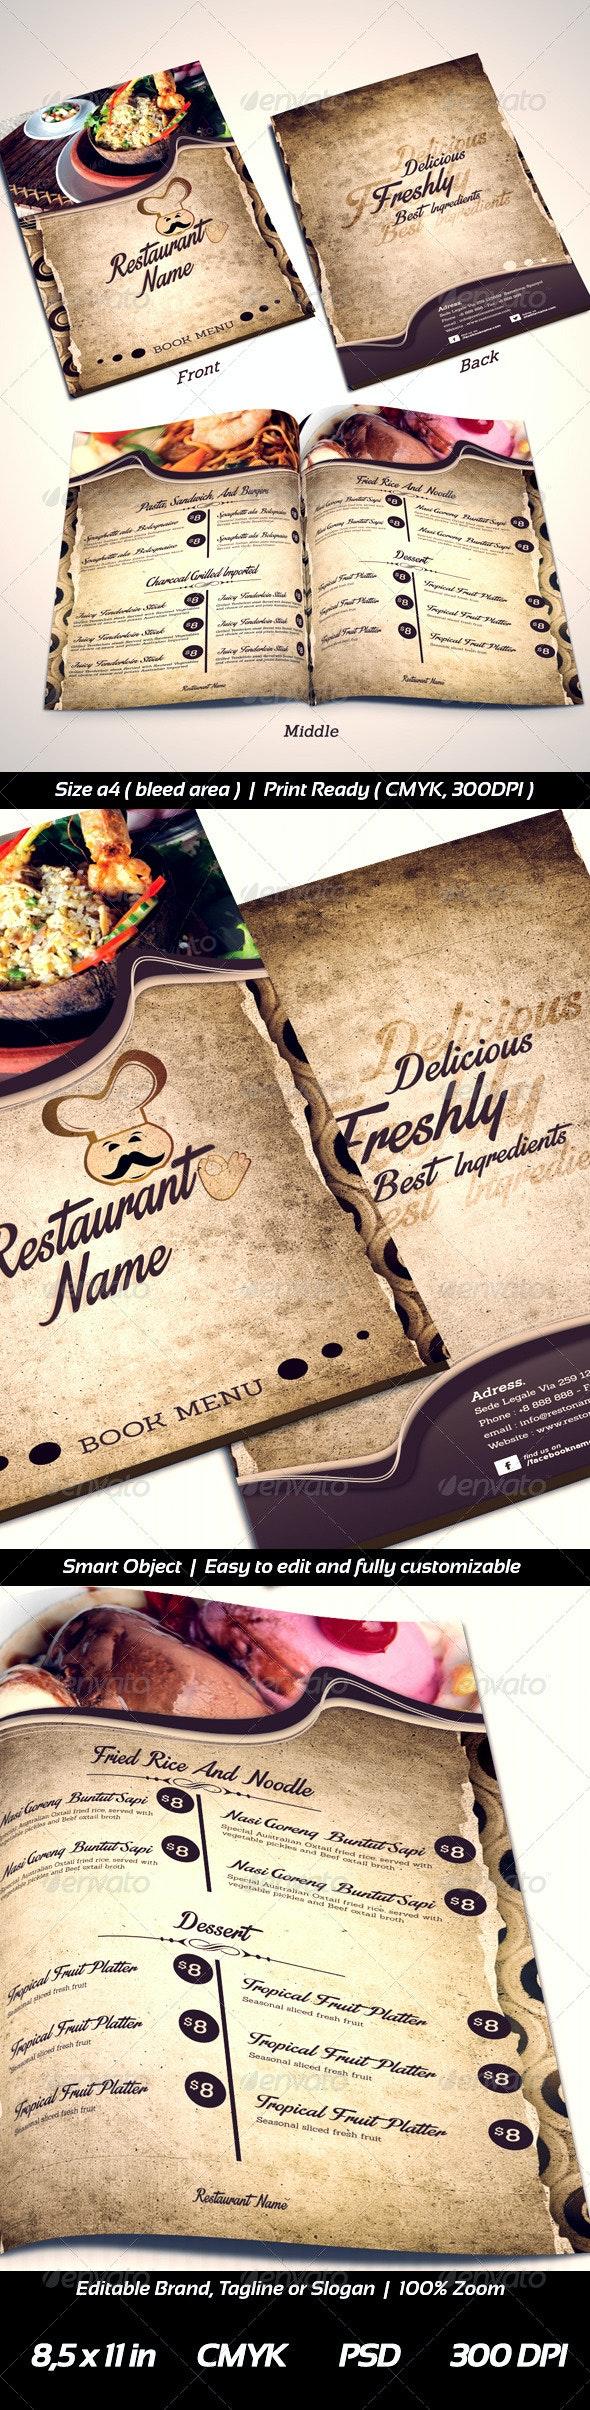 Restaurant Menu Templates Front-2 Middle-Back - Food Menus Print Templates